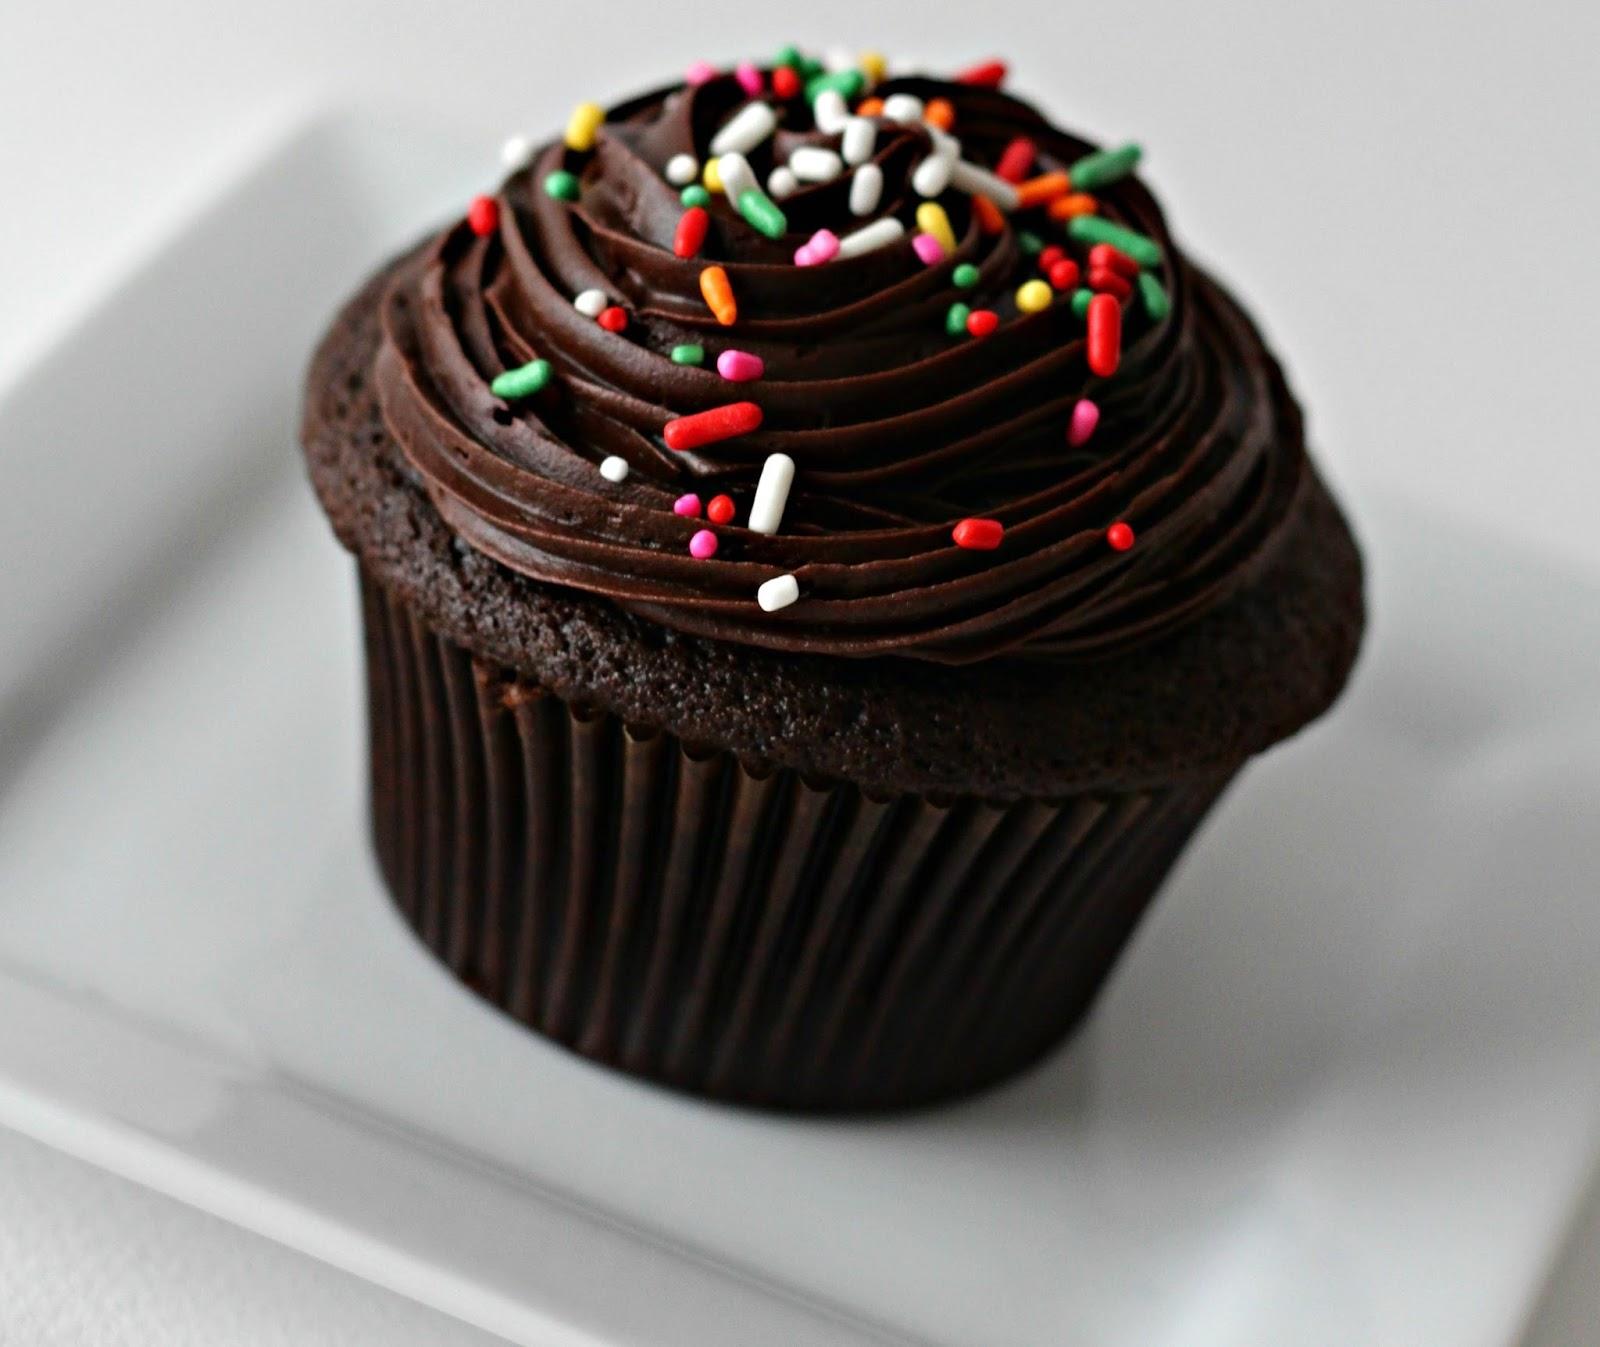 butter 60 gram sugar 100 gram(powdered) chocolate cup cakes coca cola drink  1 cup cream 100 gram chocolate 150 gram